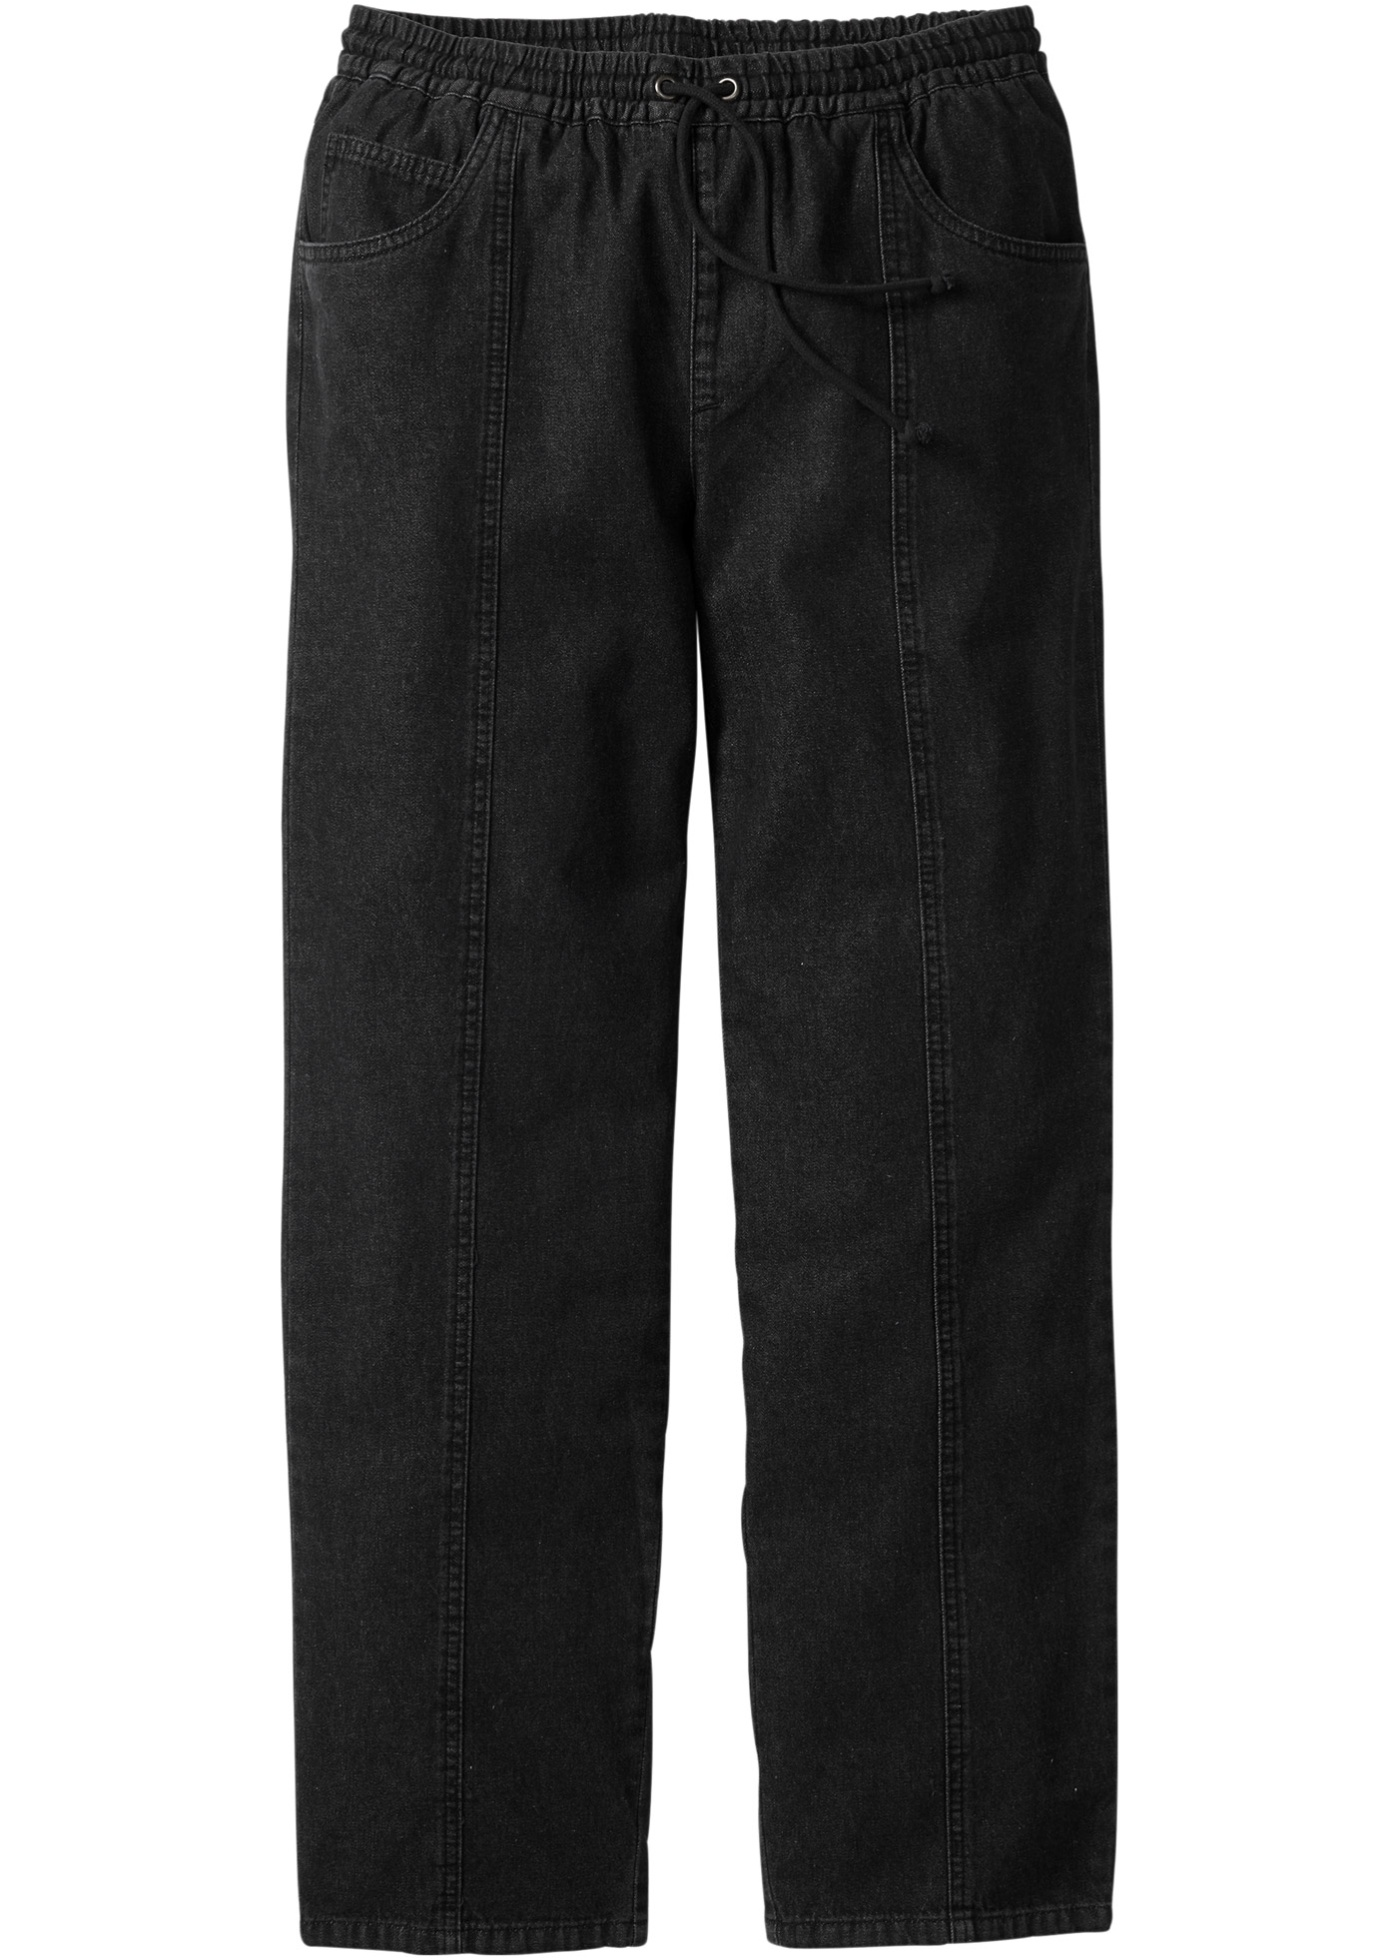 Pantalone con elastico cl